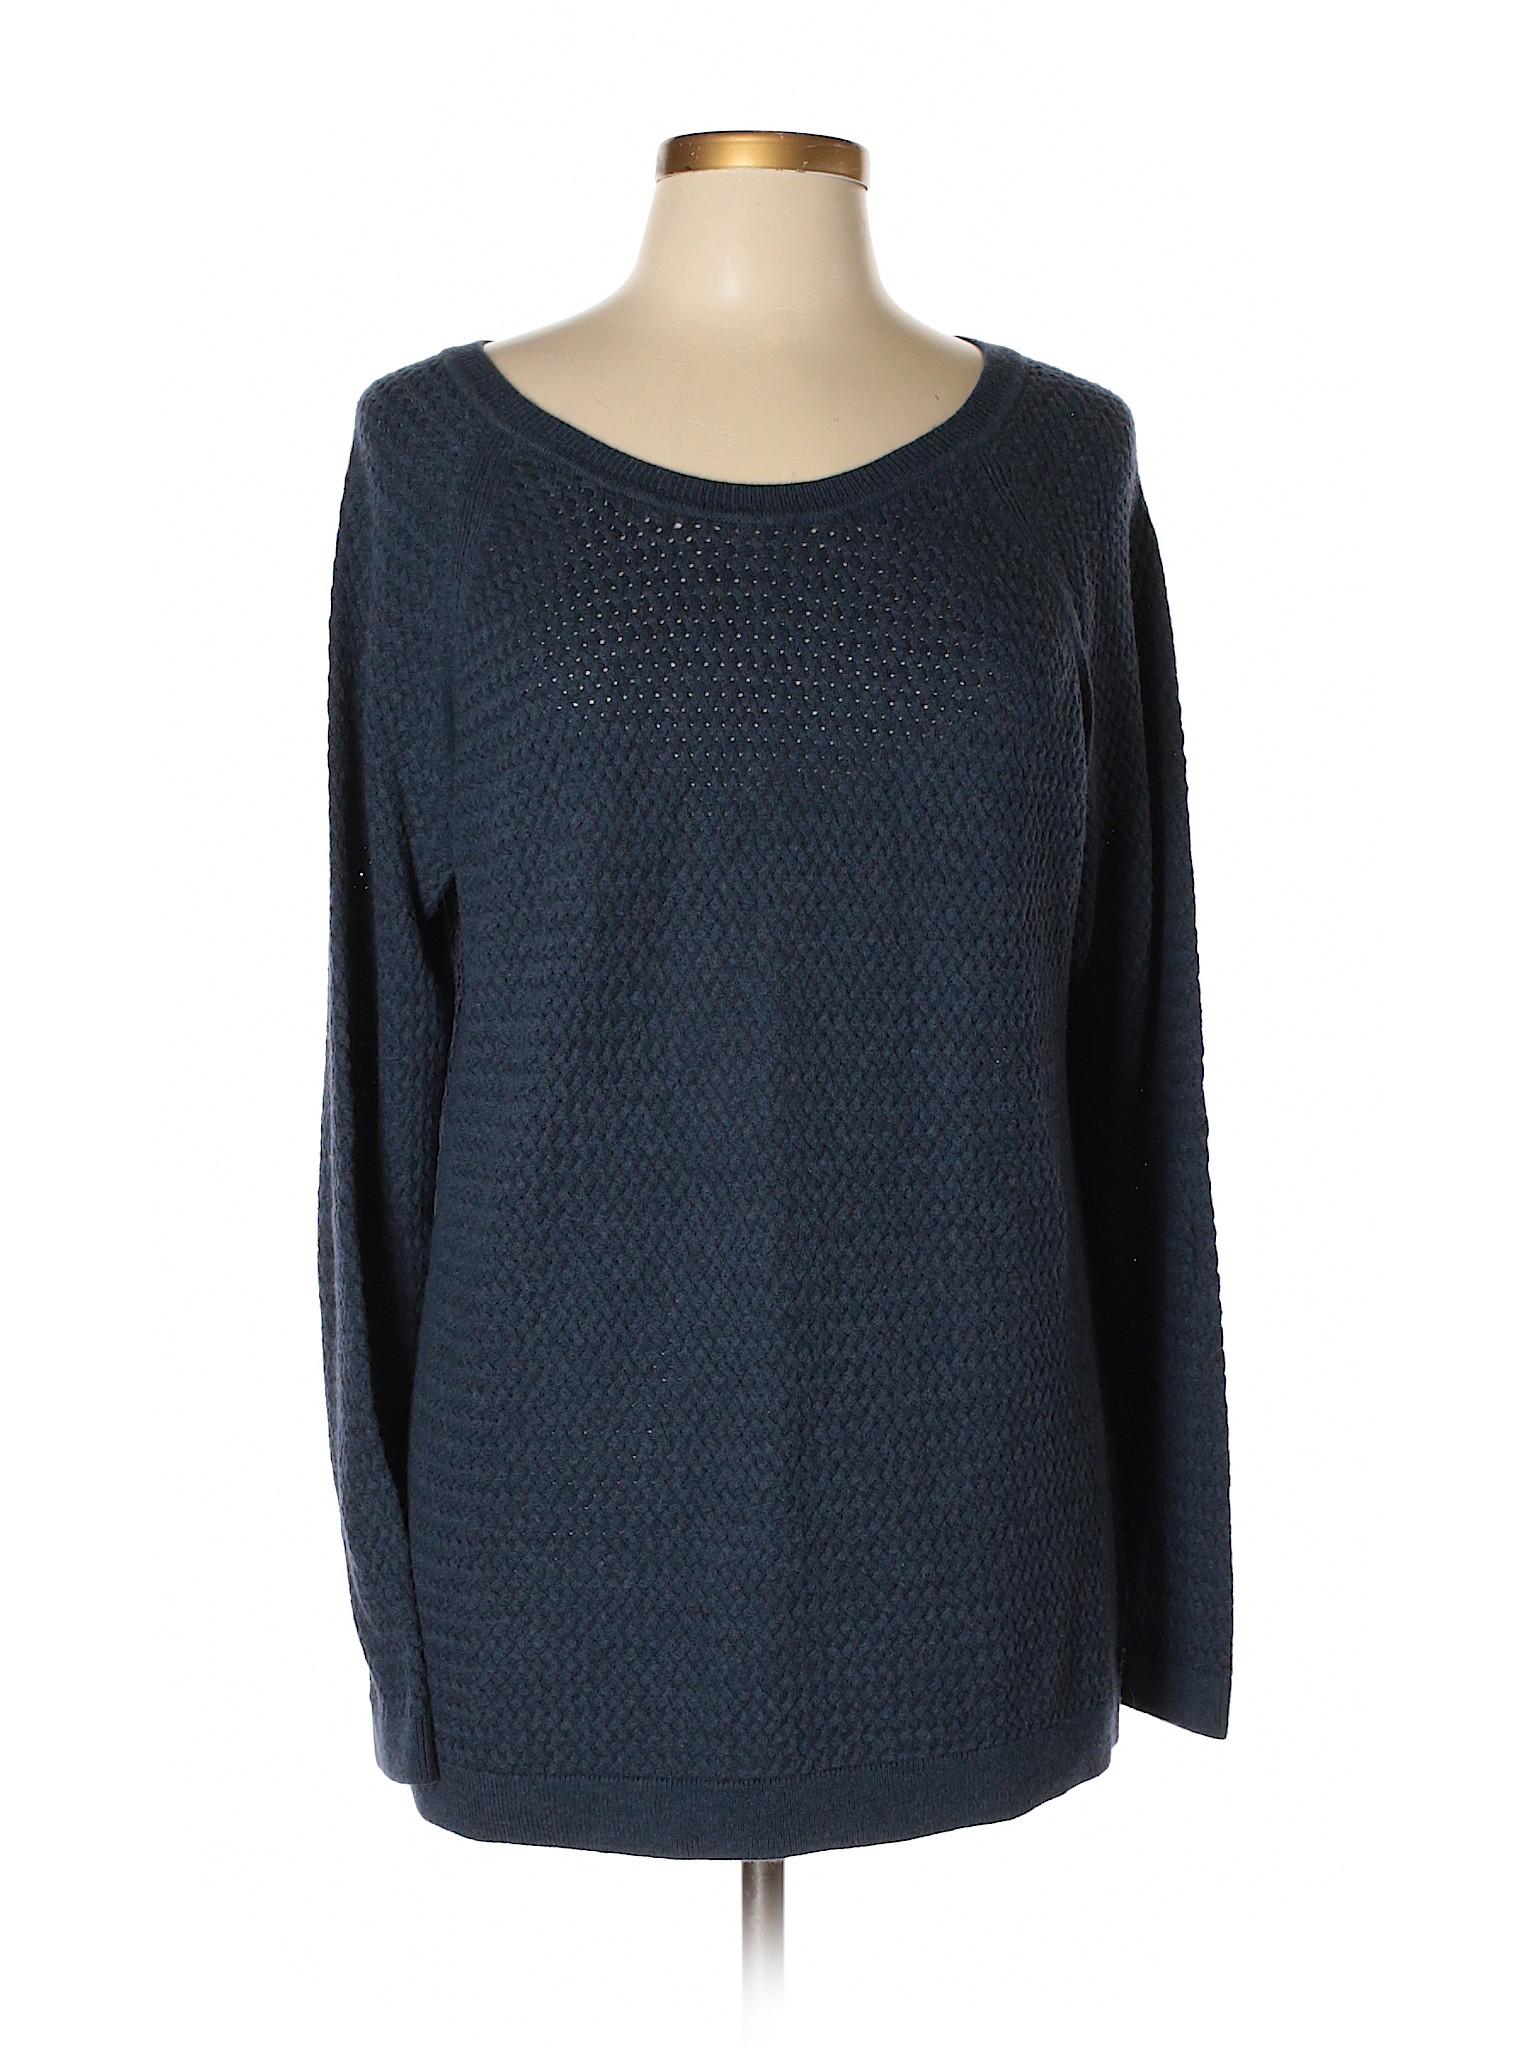 Pullover life style SONOMA Sweater Boutique winter qOngvxwIv0